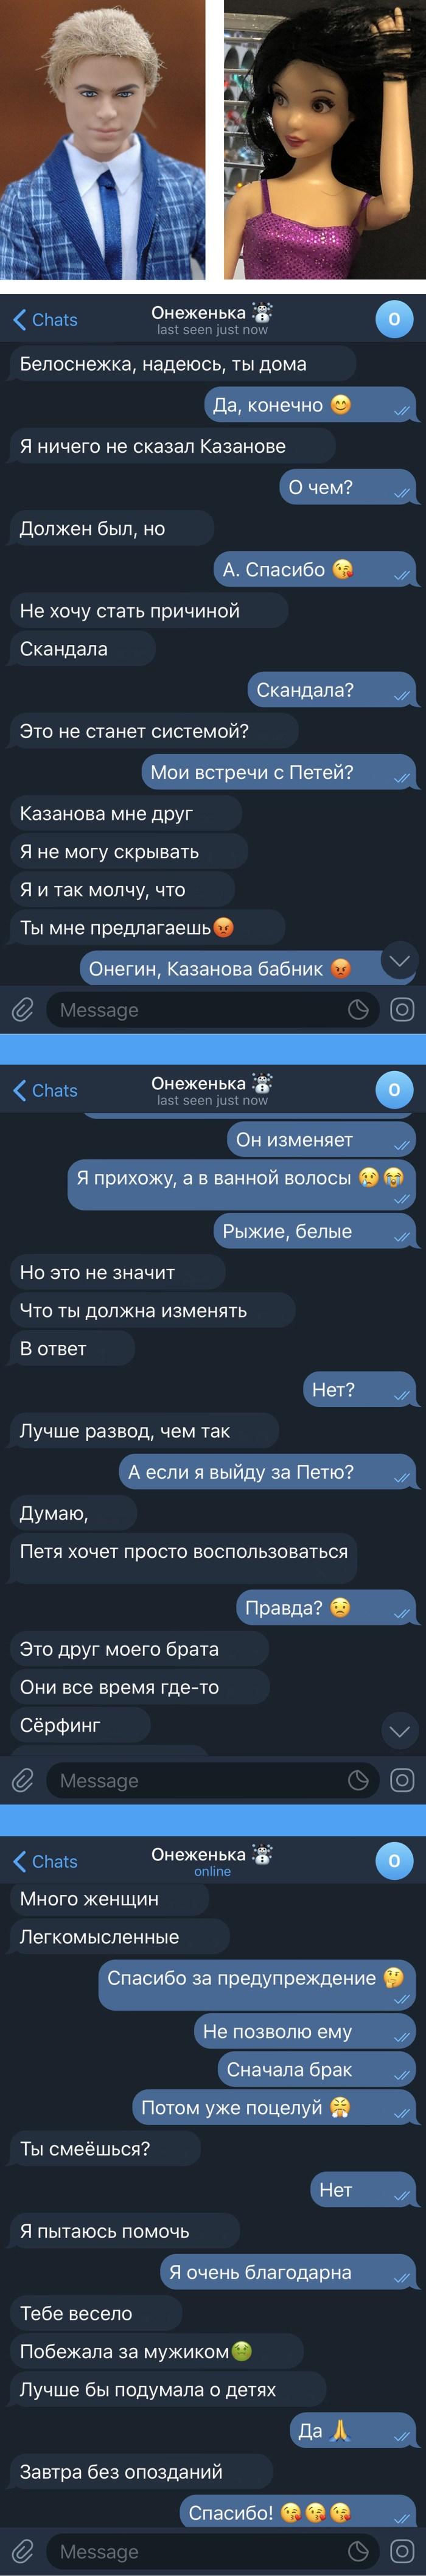 Telegram Онегин – Белоснежка